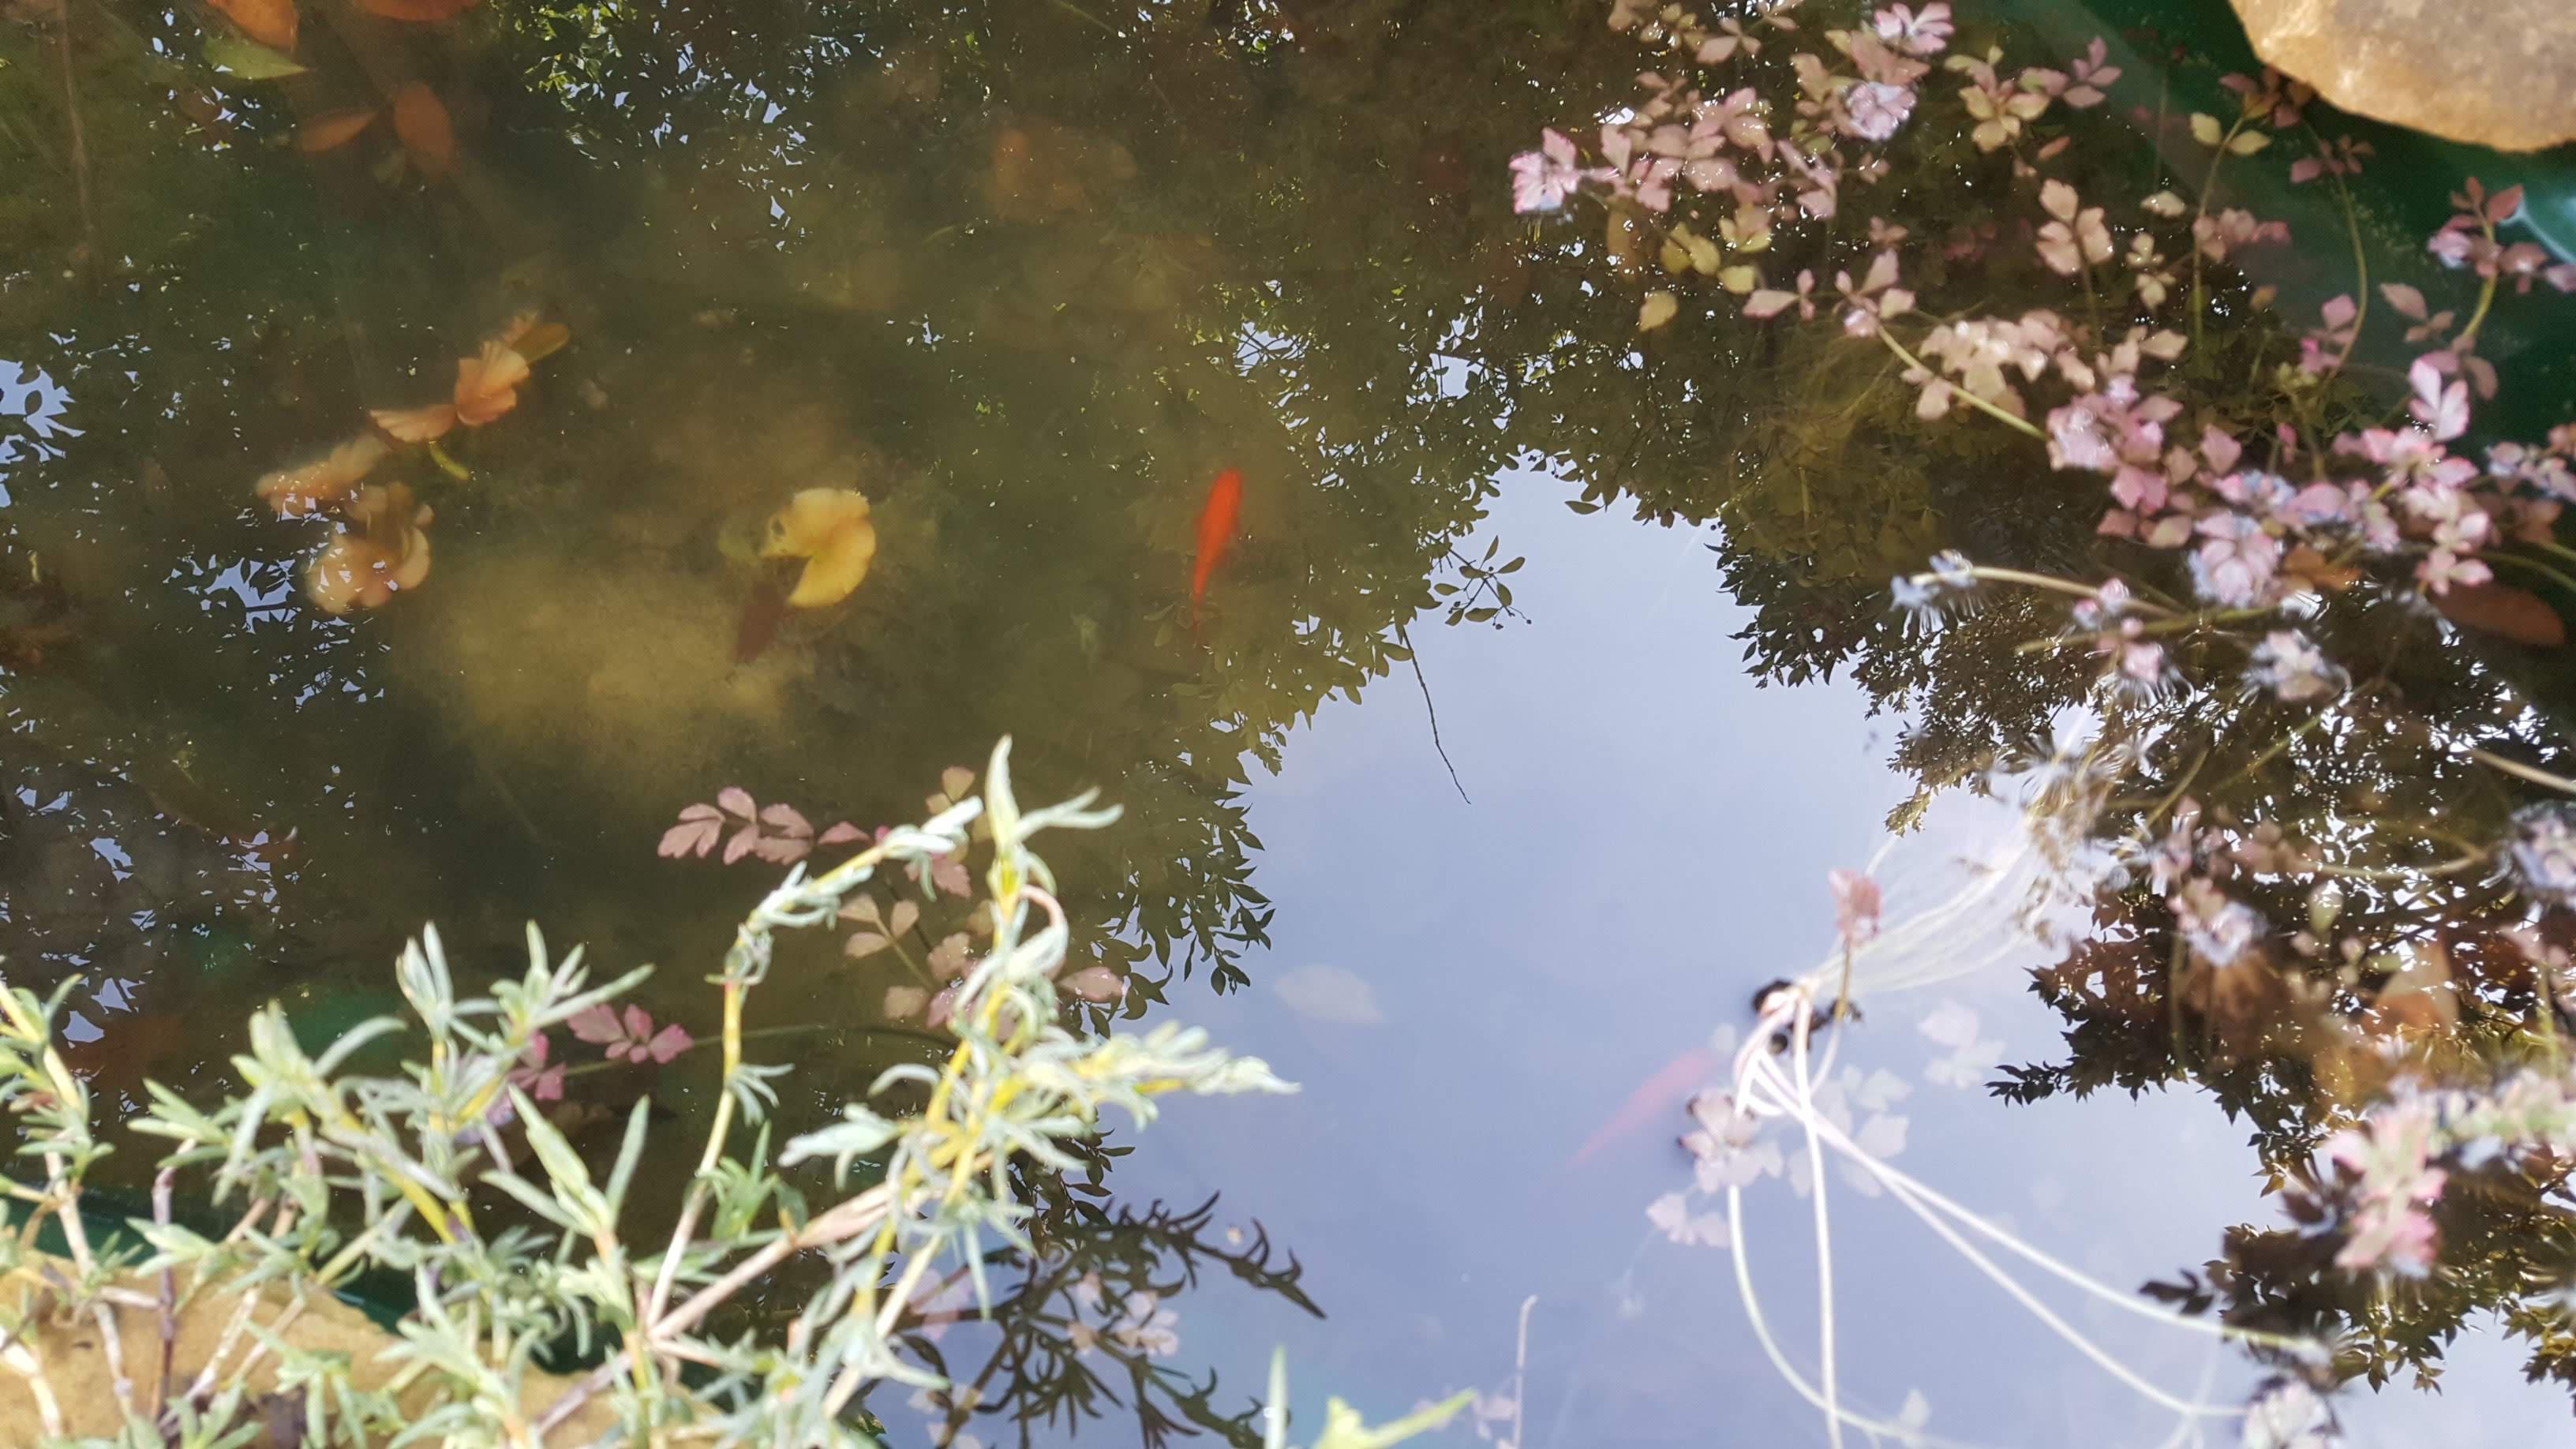 Fish happy in pond, Feb 19